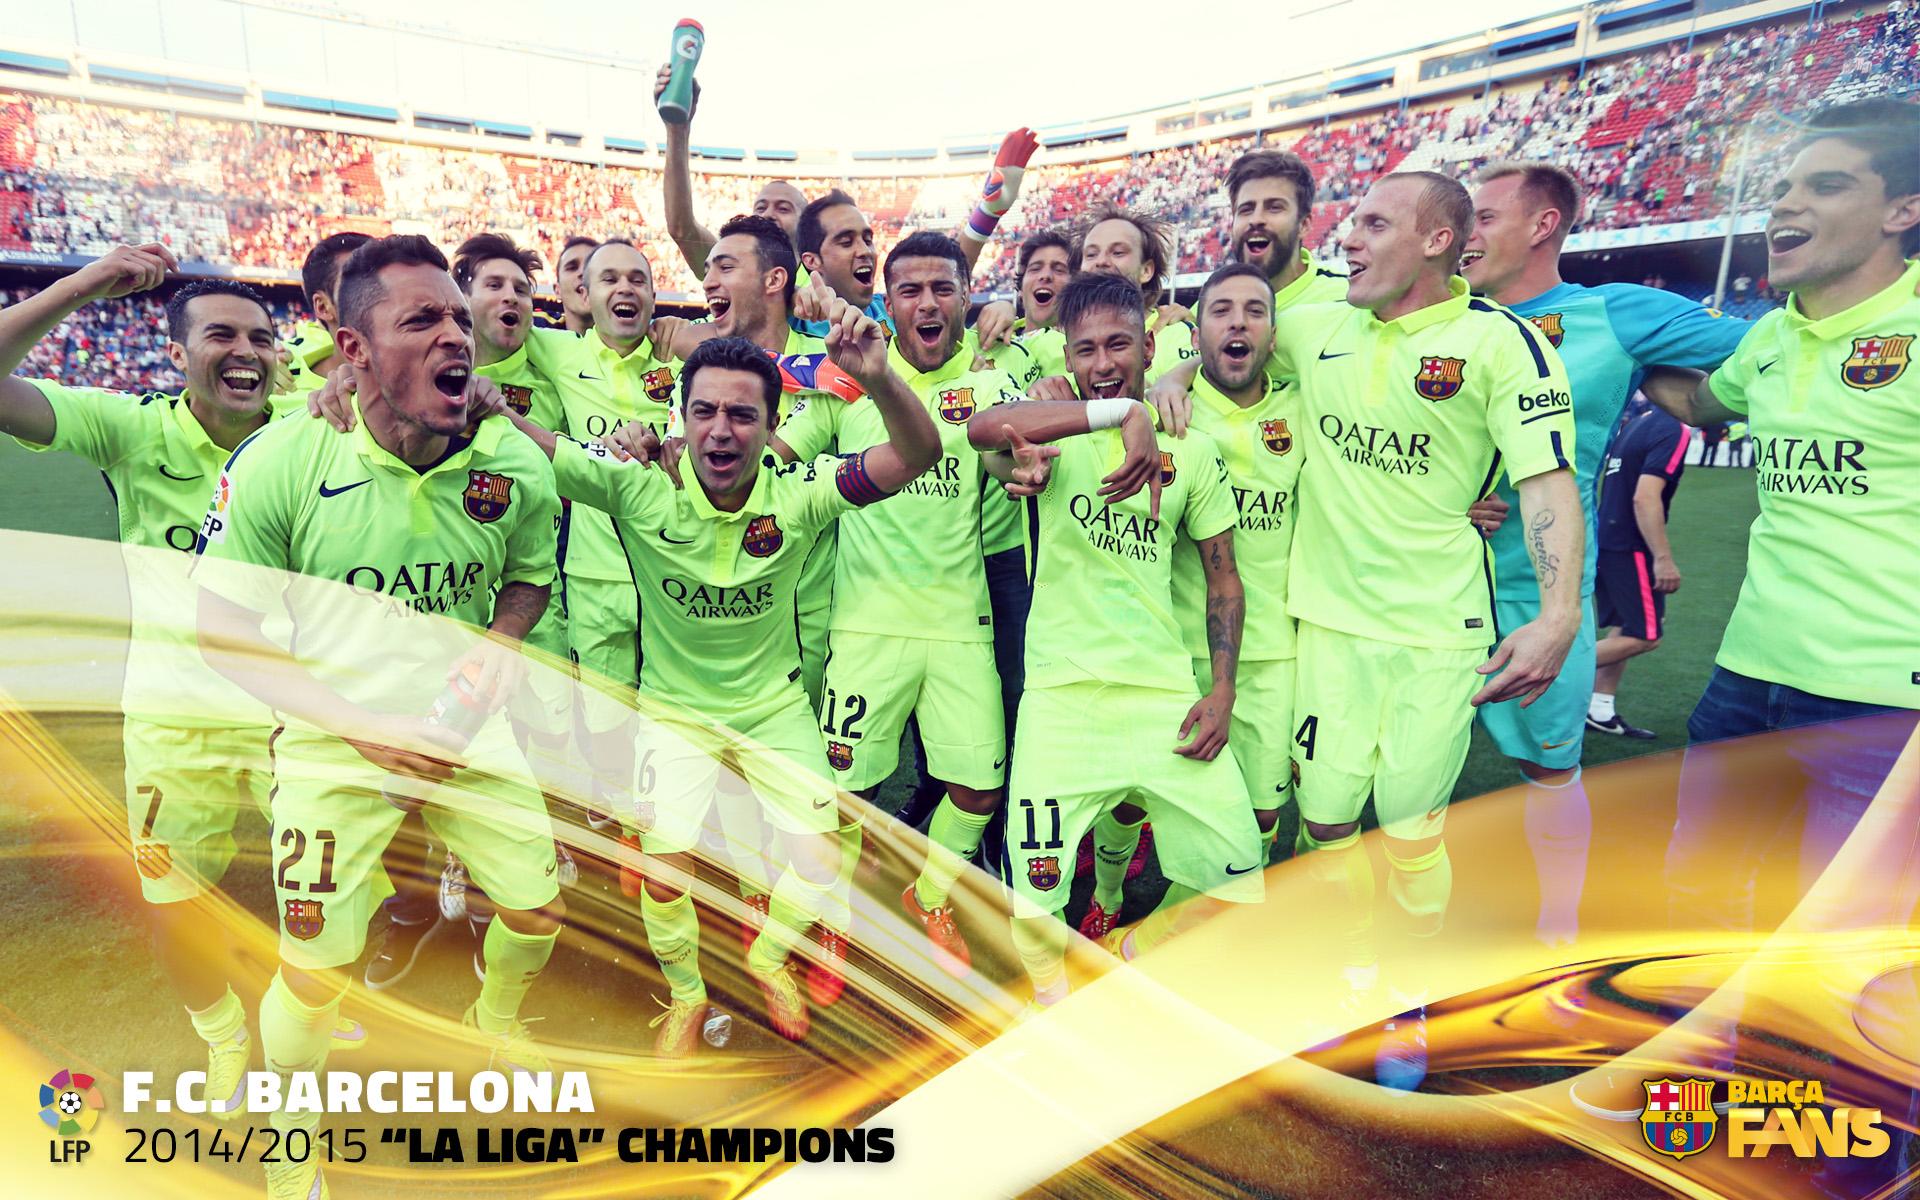 campions_lliga_wallpaper_2_1920x1200_eng.v1431941971